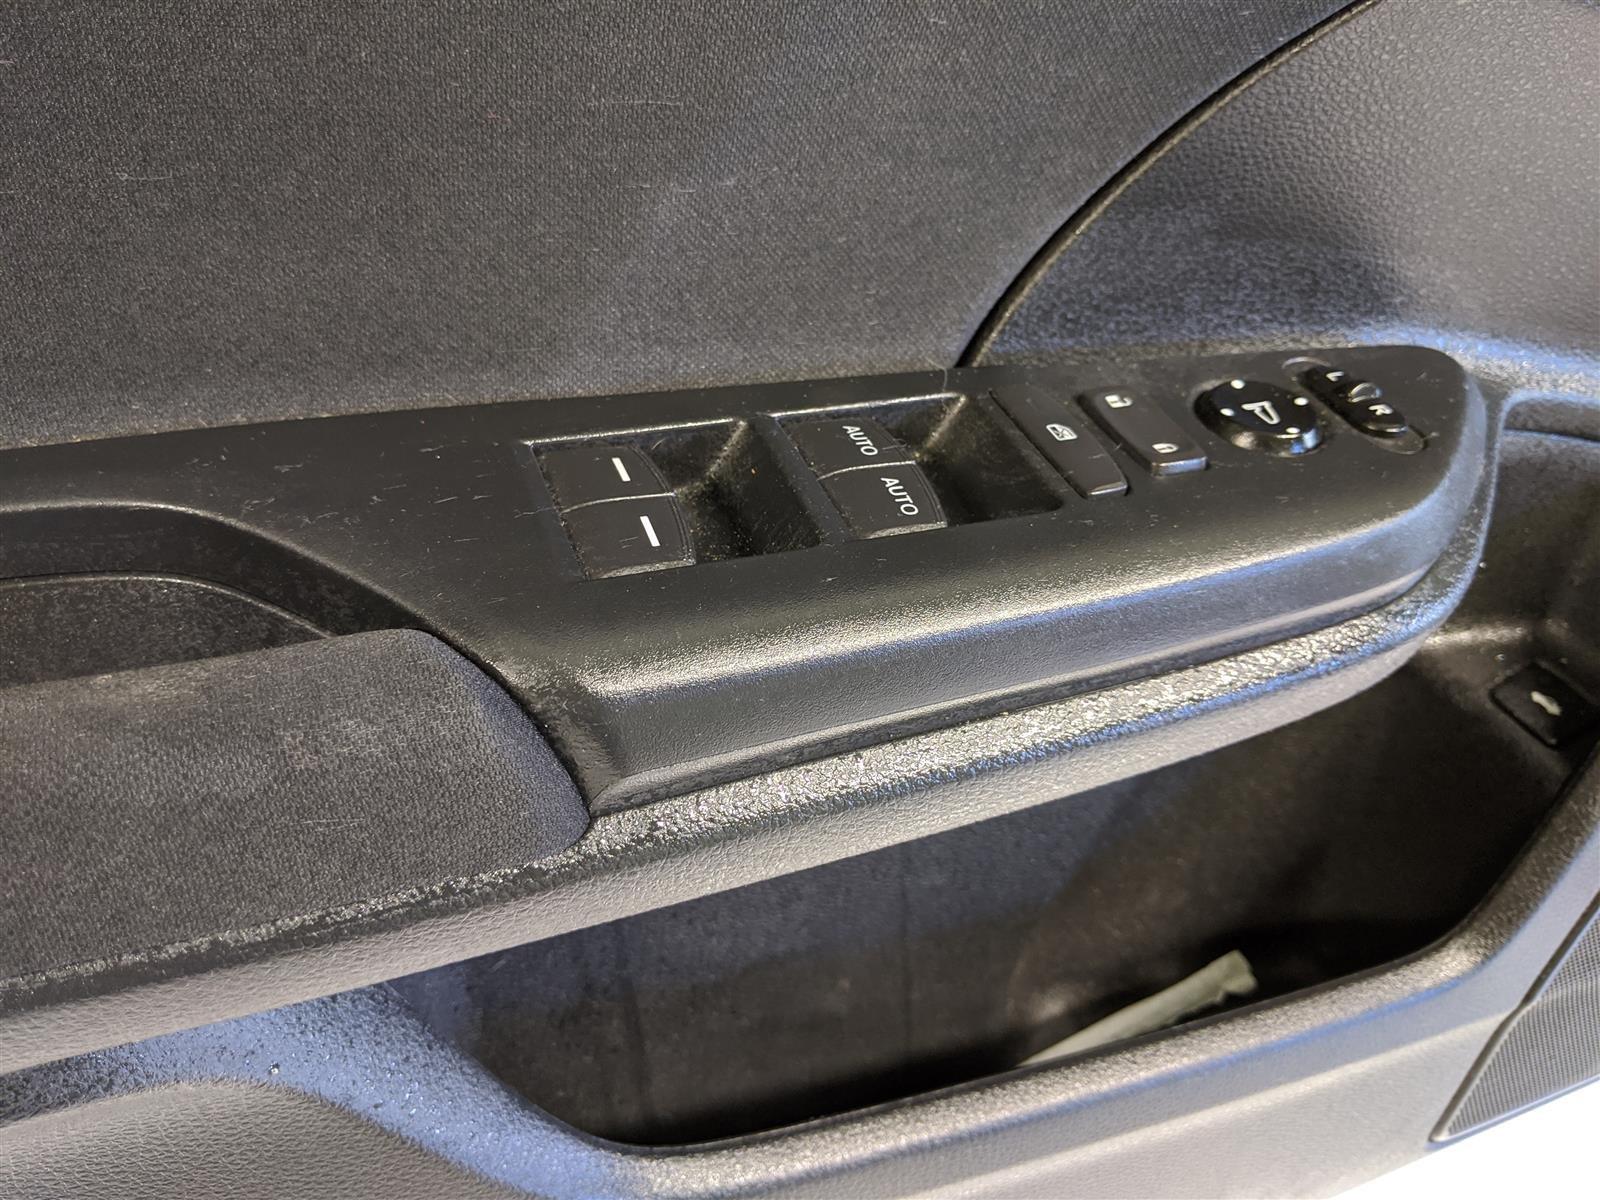 2018 Honda Civic Master Window Switch Replacement